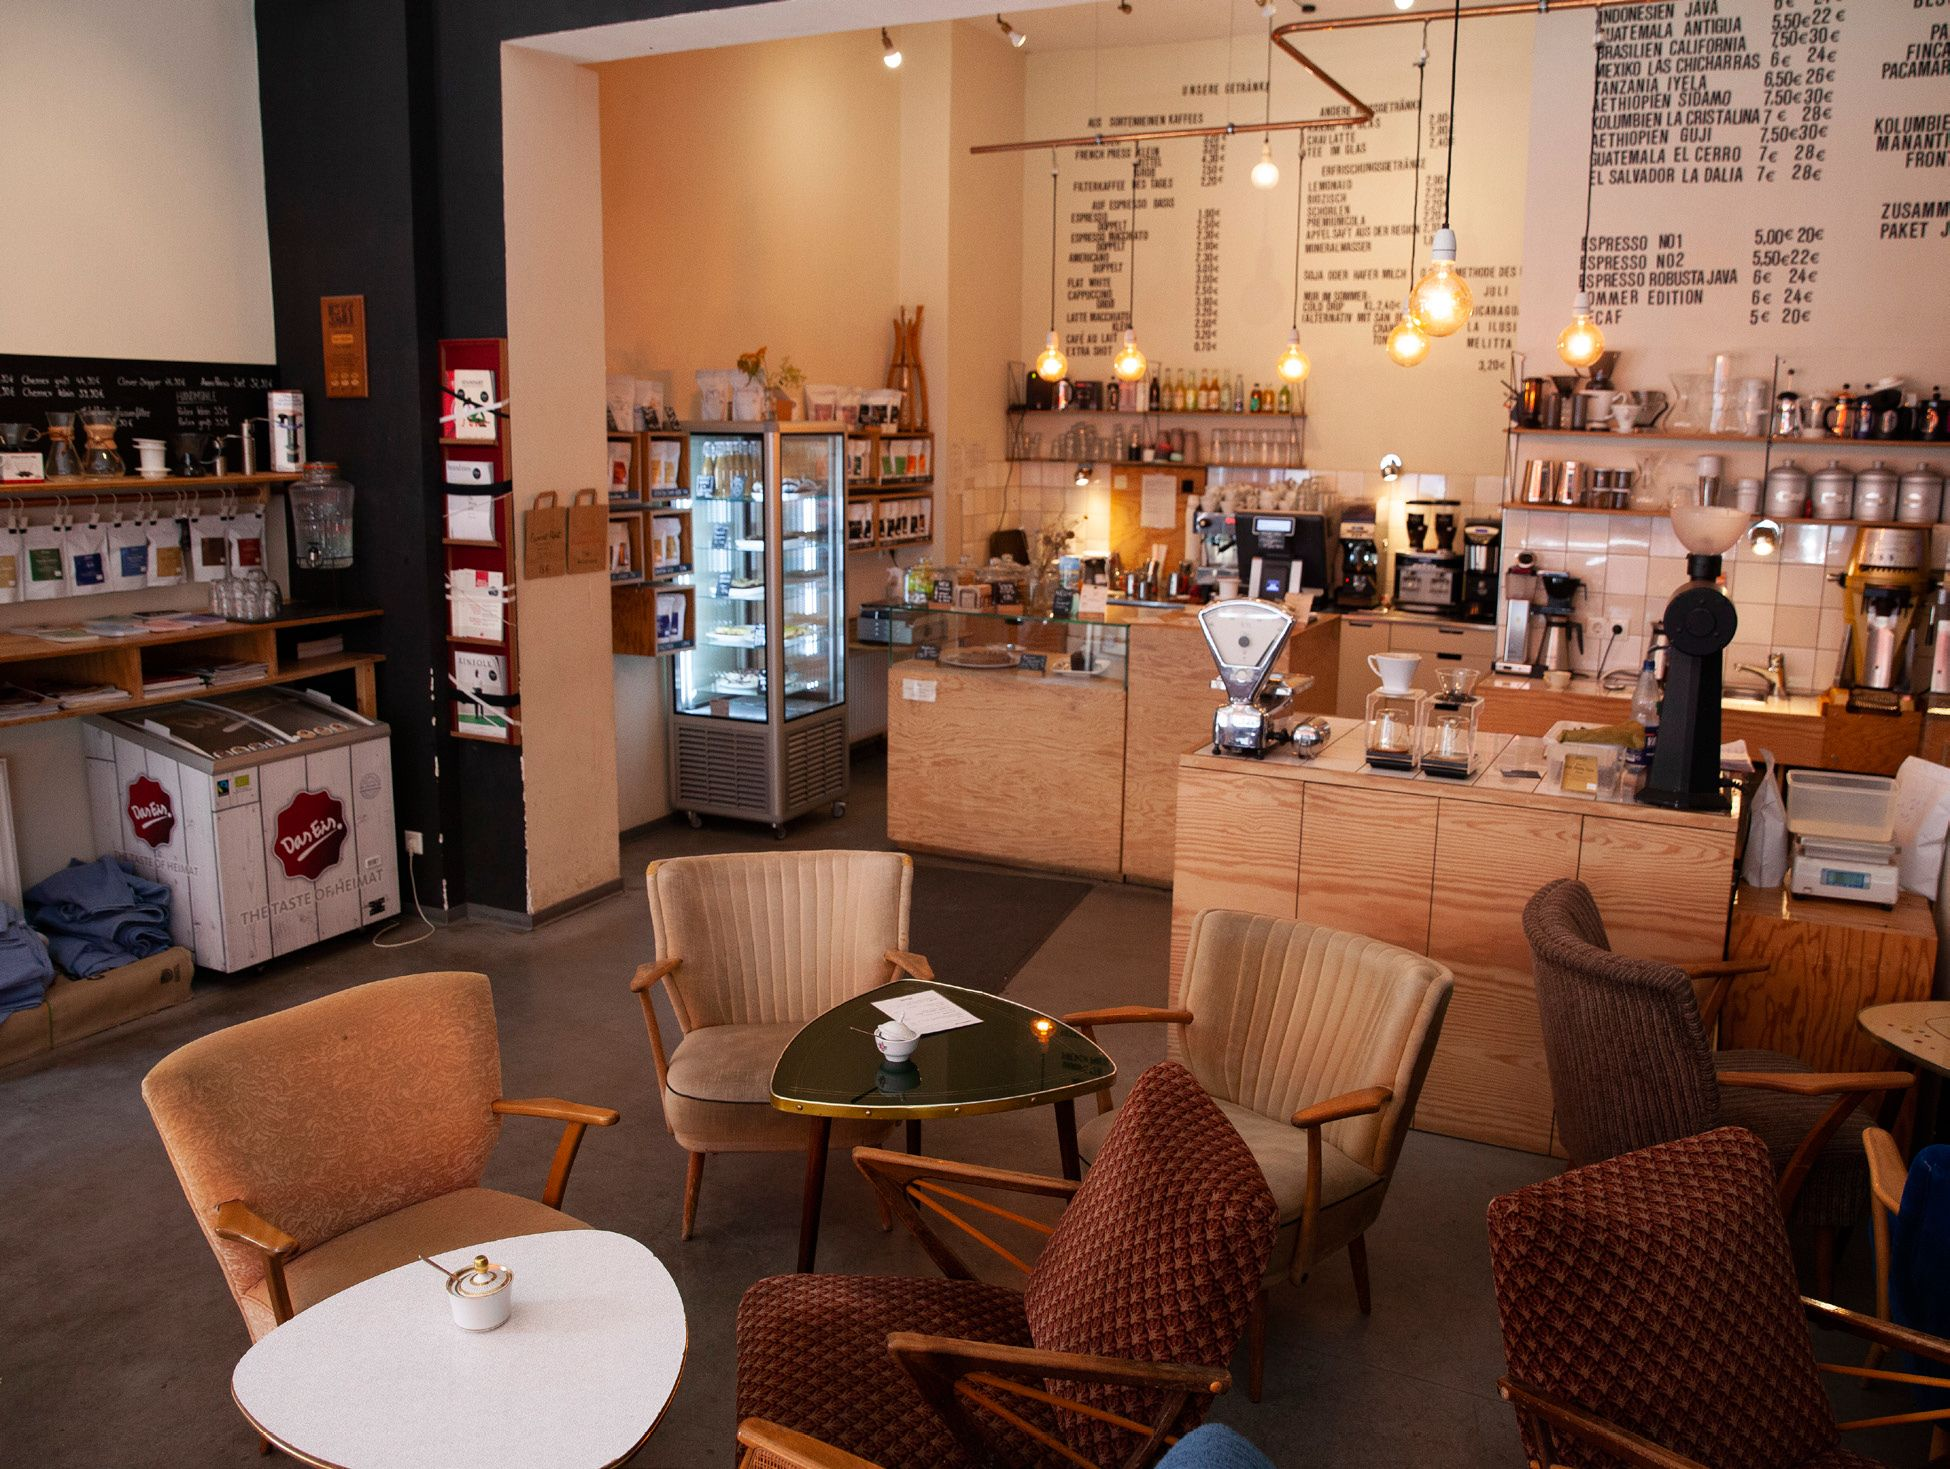 24grad Cafe